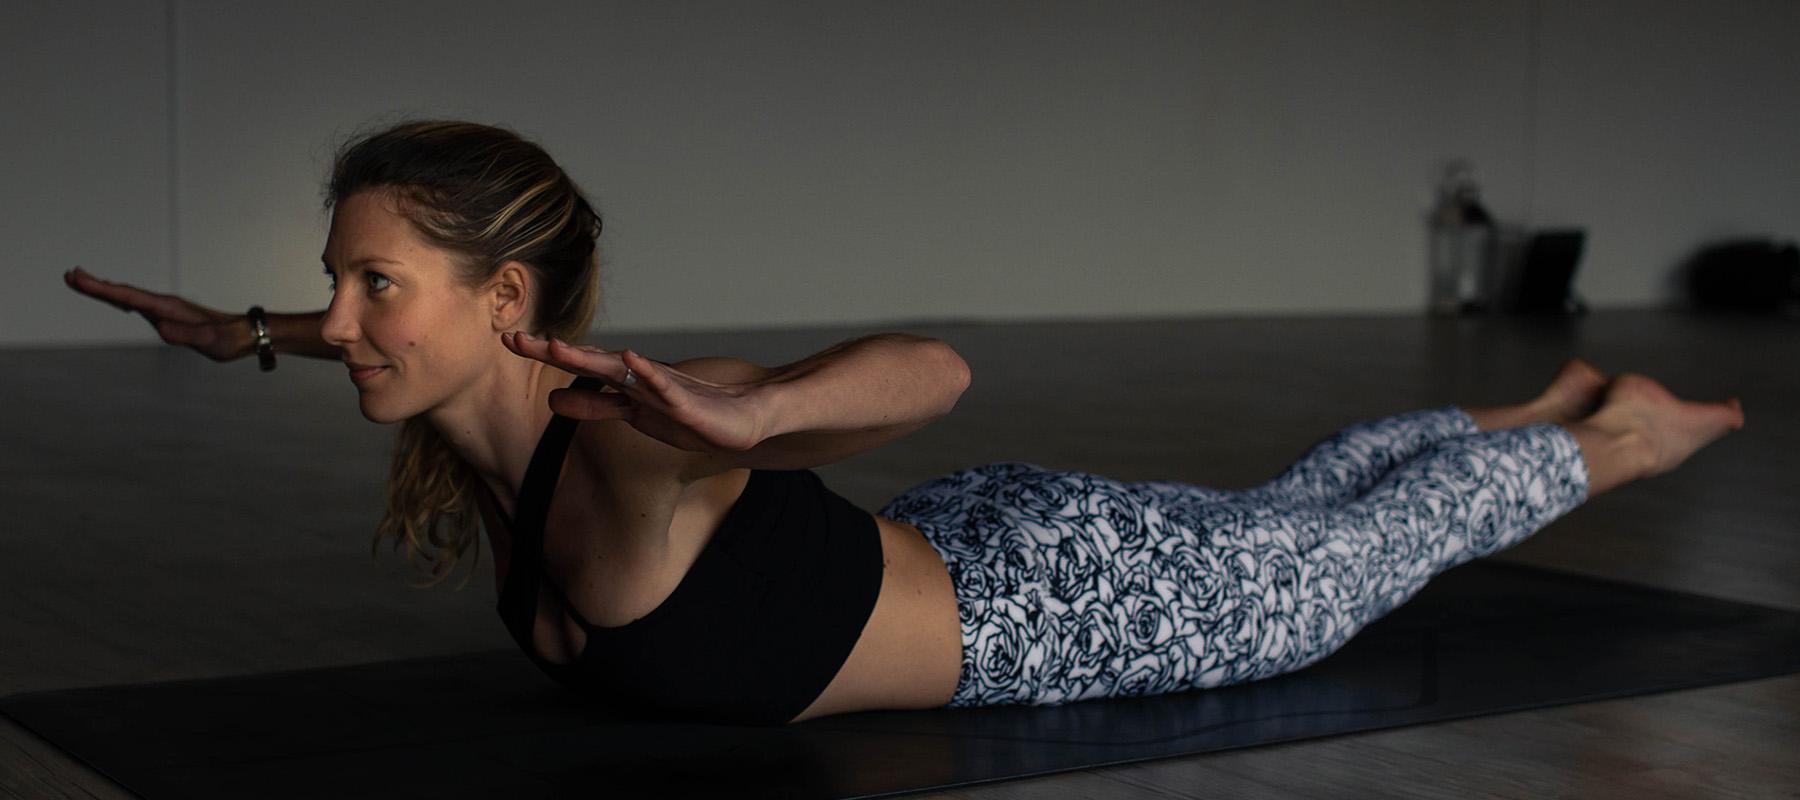 Helen Clare back bending yoga